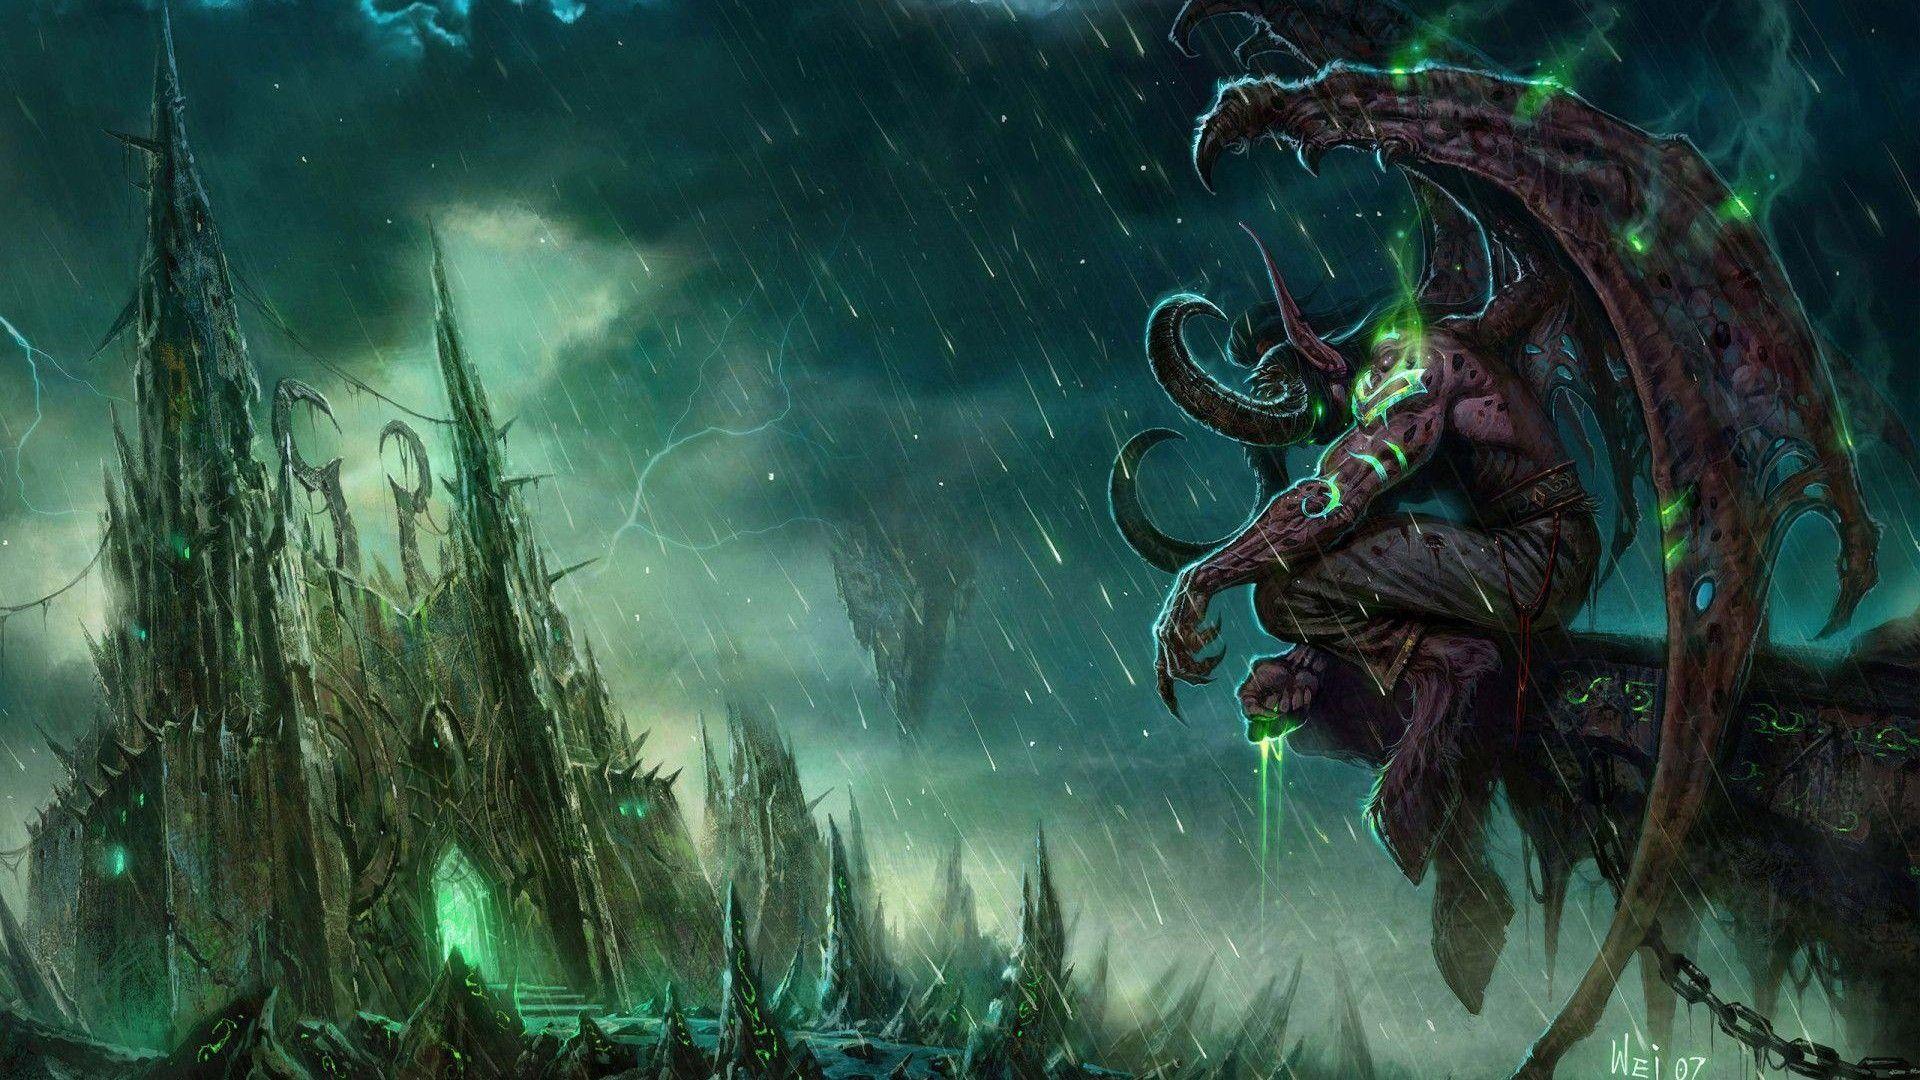 Dark Fantasy Wallpaper Hd World Of Warcraft Dark Fantasy Warcraft